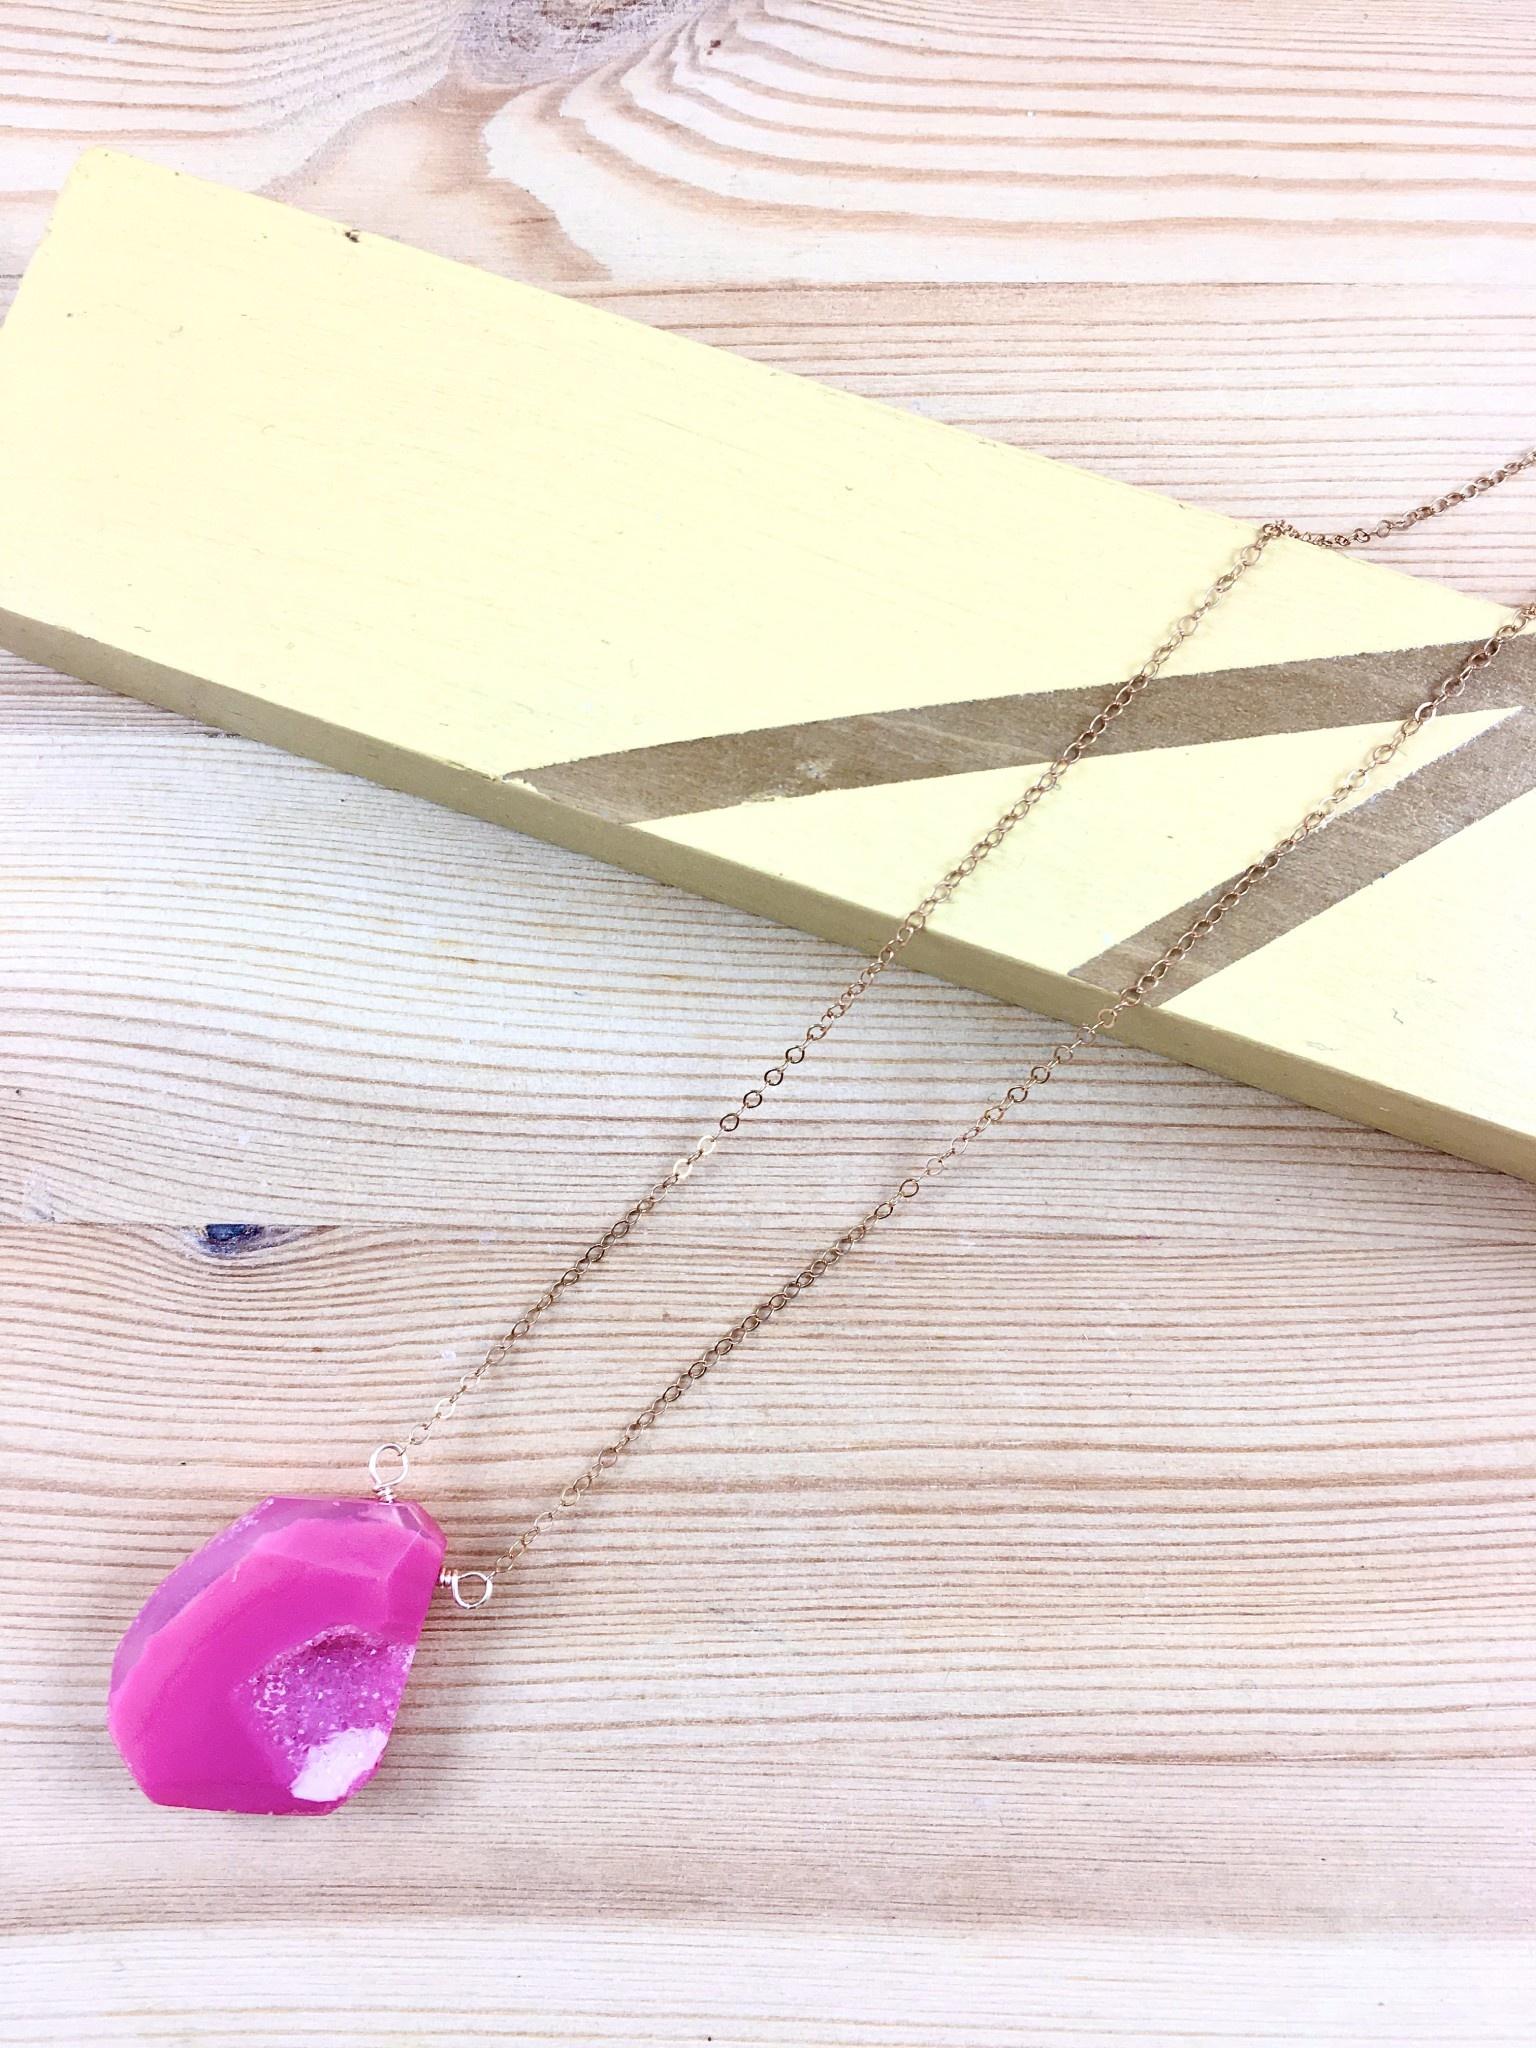 Salame Jewelry Design Drusy Quartz Rose Gold Necklace - M